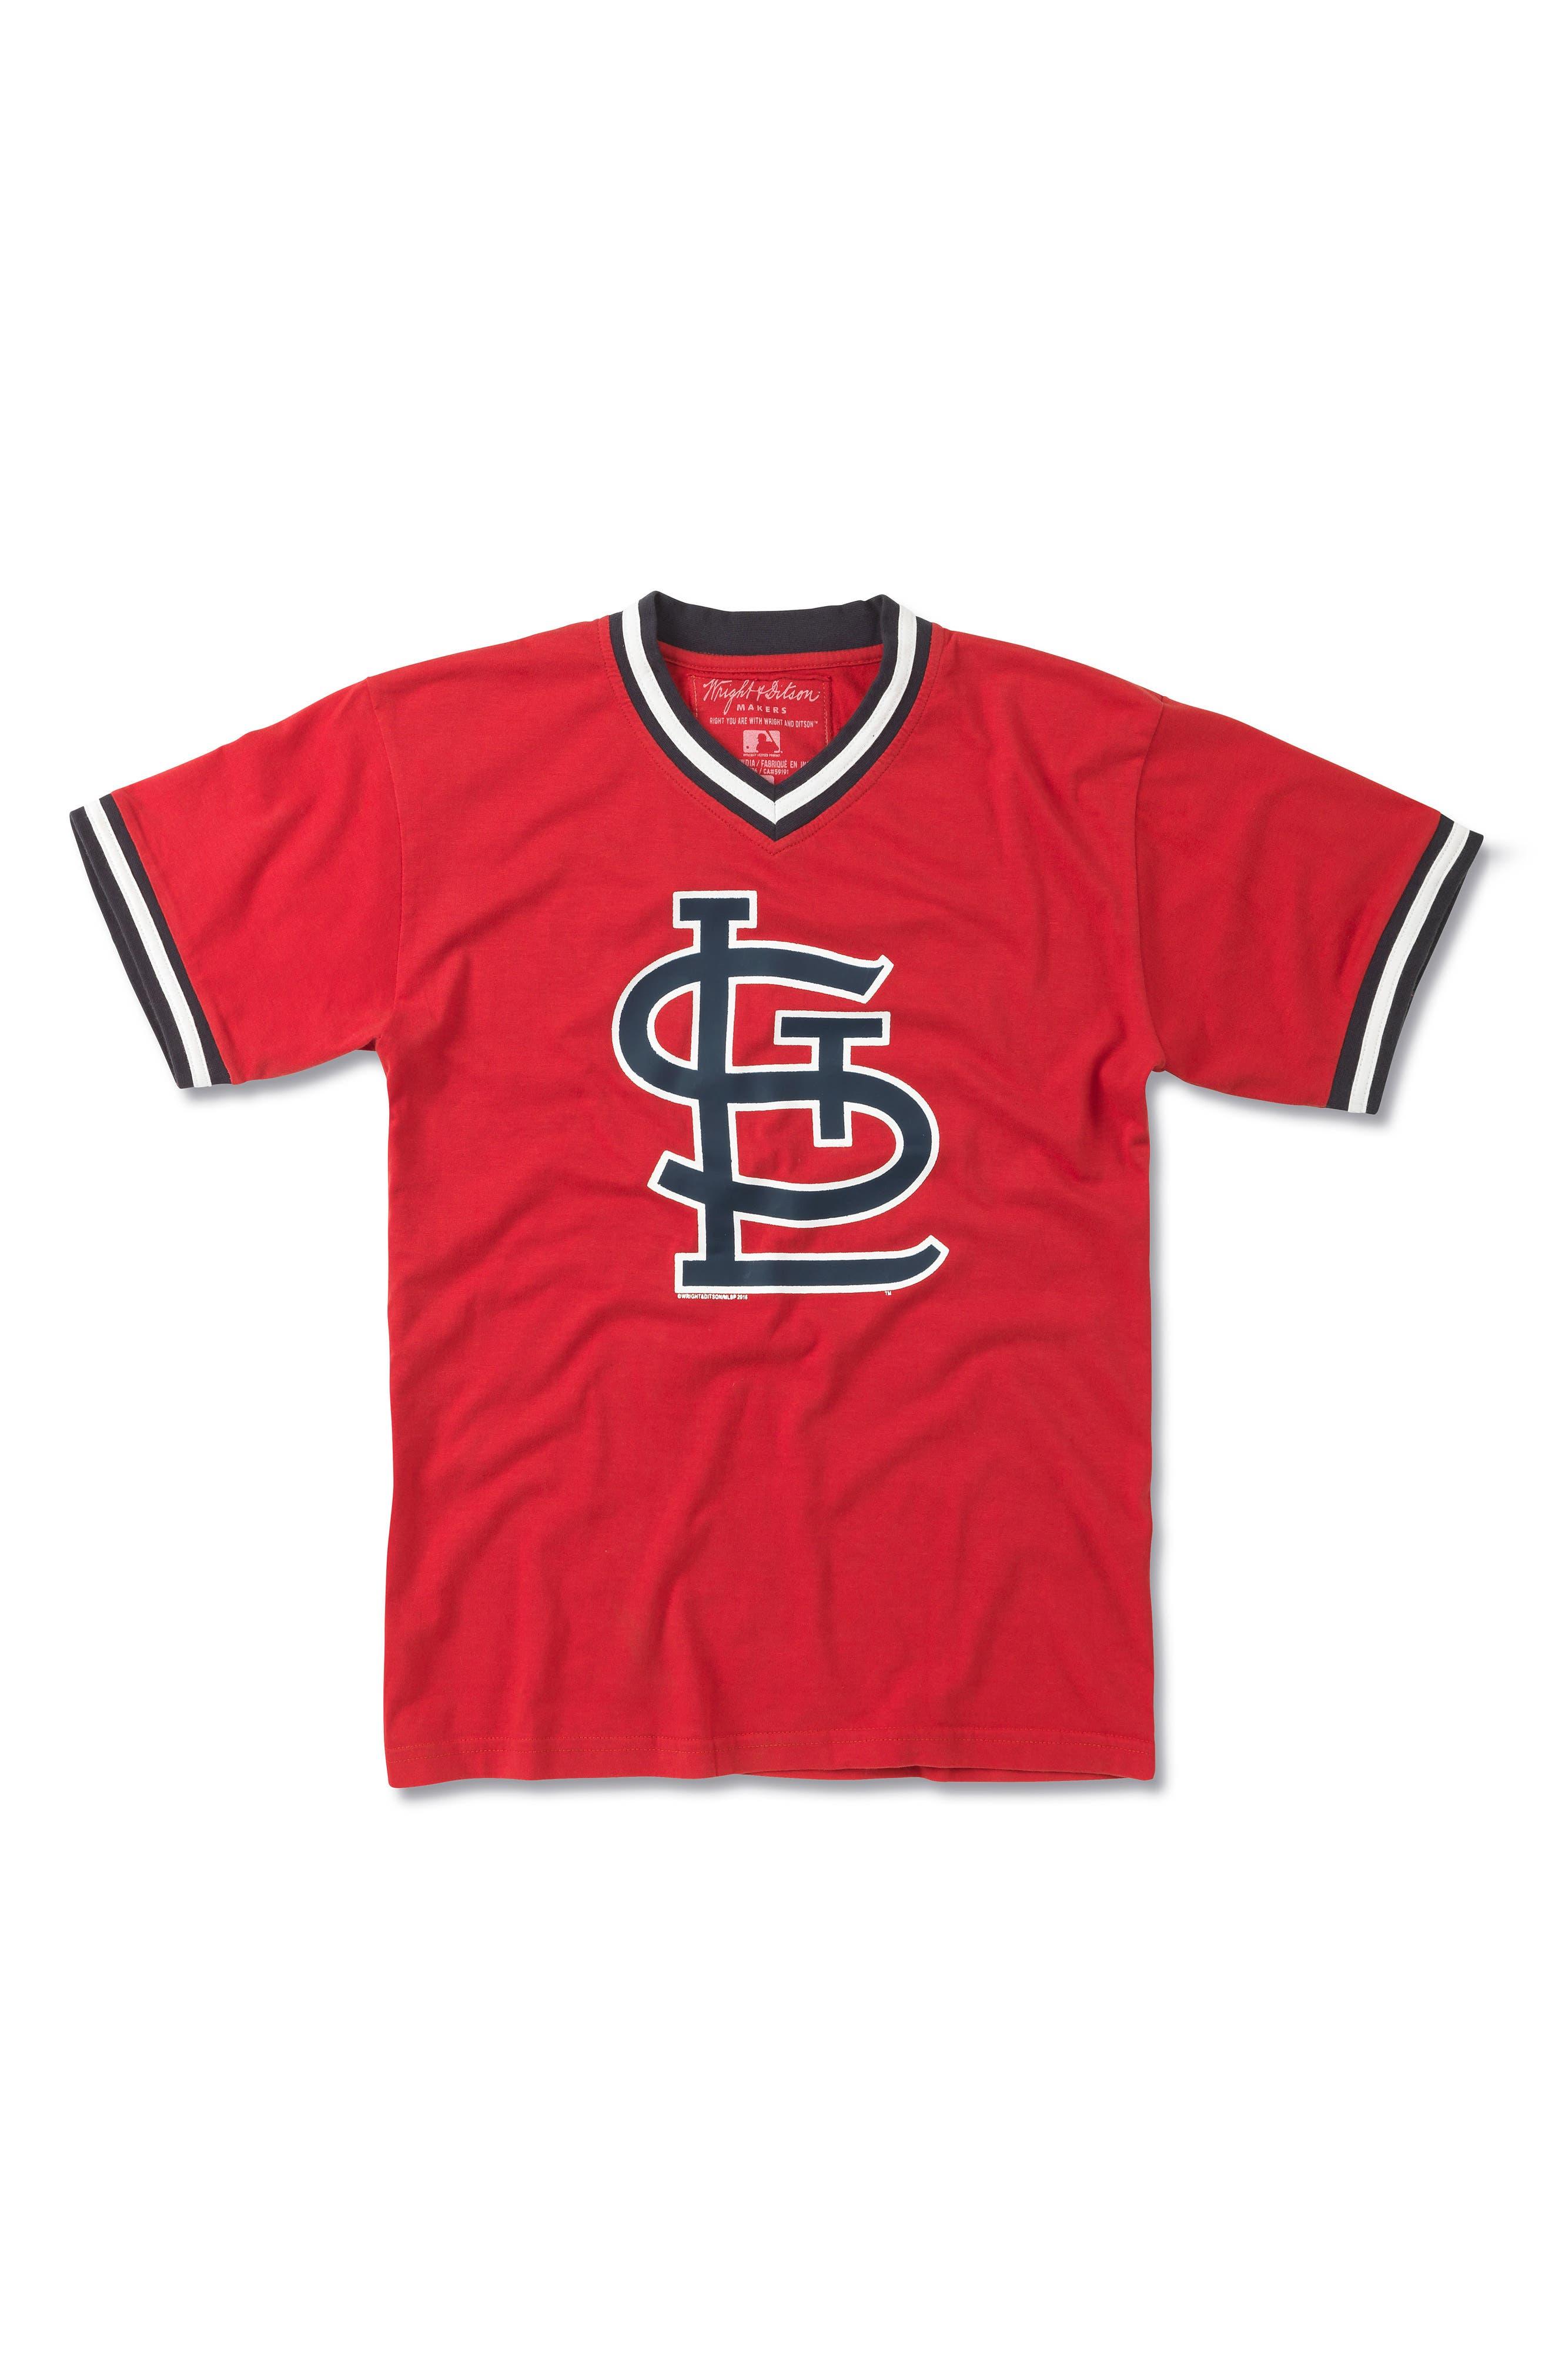 Alternate Image 1 Selected - Wright & Ditson St. Louis Cardinals T-Shirt (Little Boys & Big Boys)